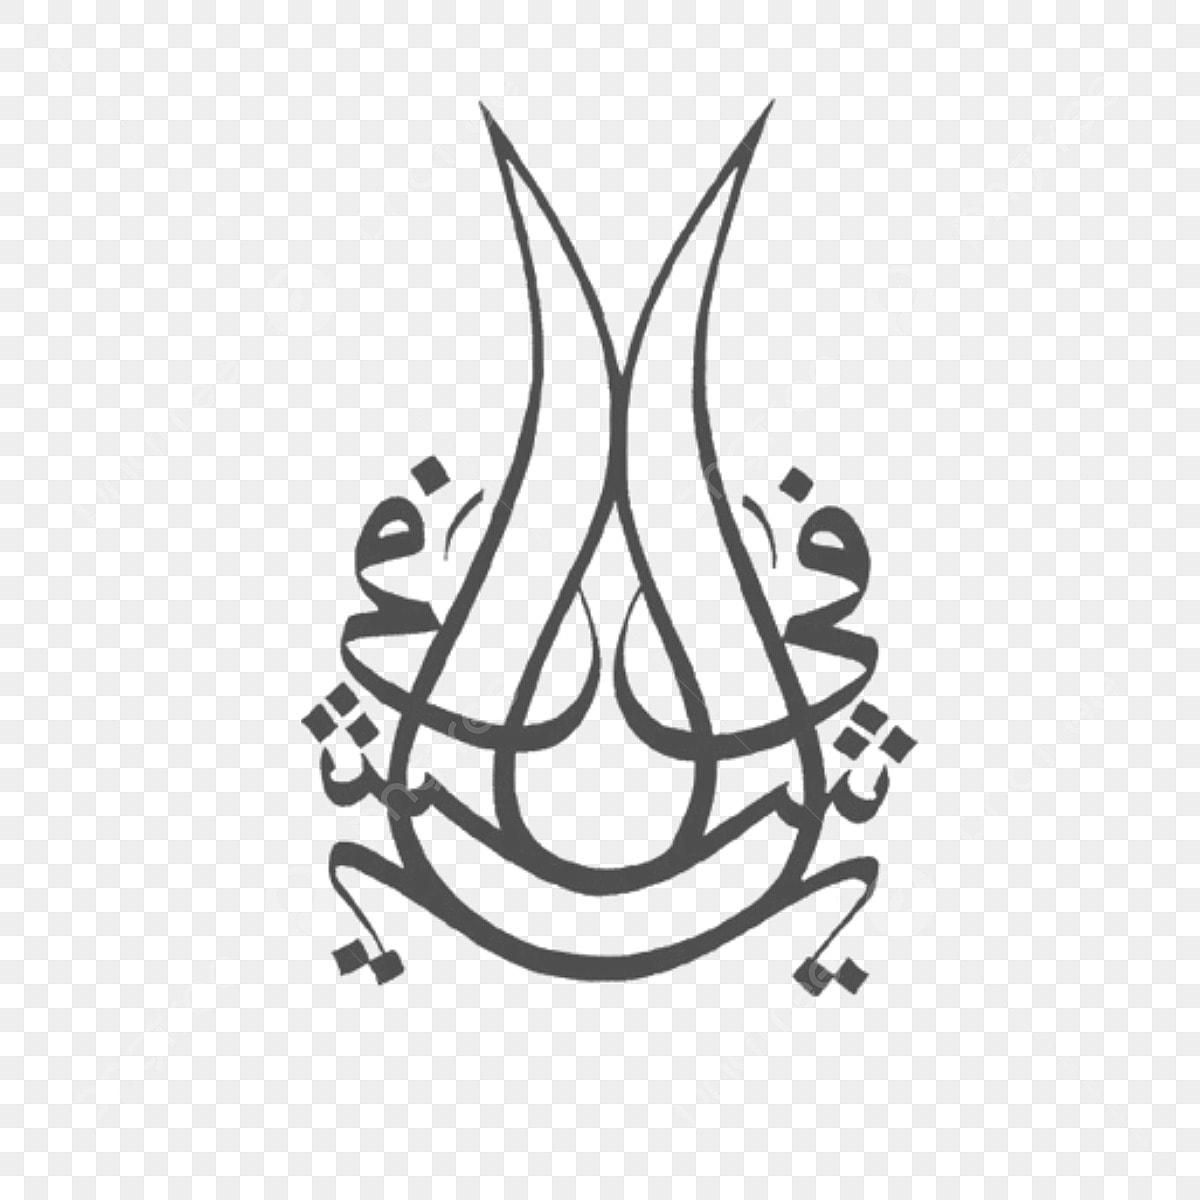 Arabic Tattoos Symbols Design Png Transparent Transparent Icons Arabic Tattoos Celebrities Arabic Tattoos On Arm Png Transparent Clipart Image And Psd File For Free Download